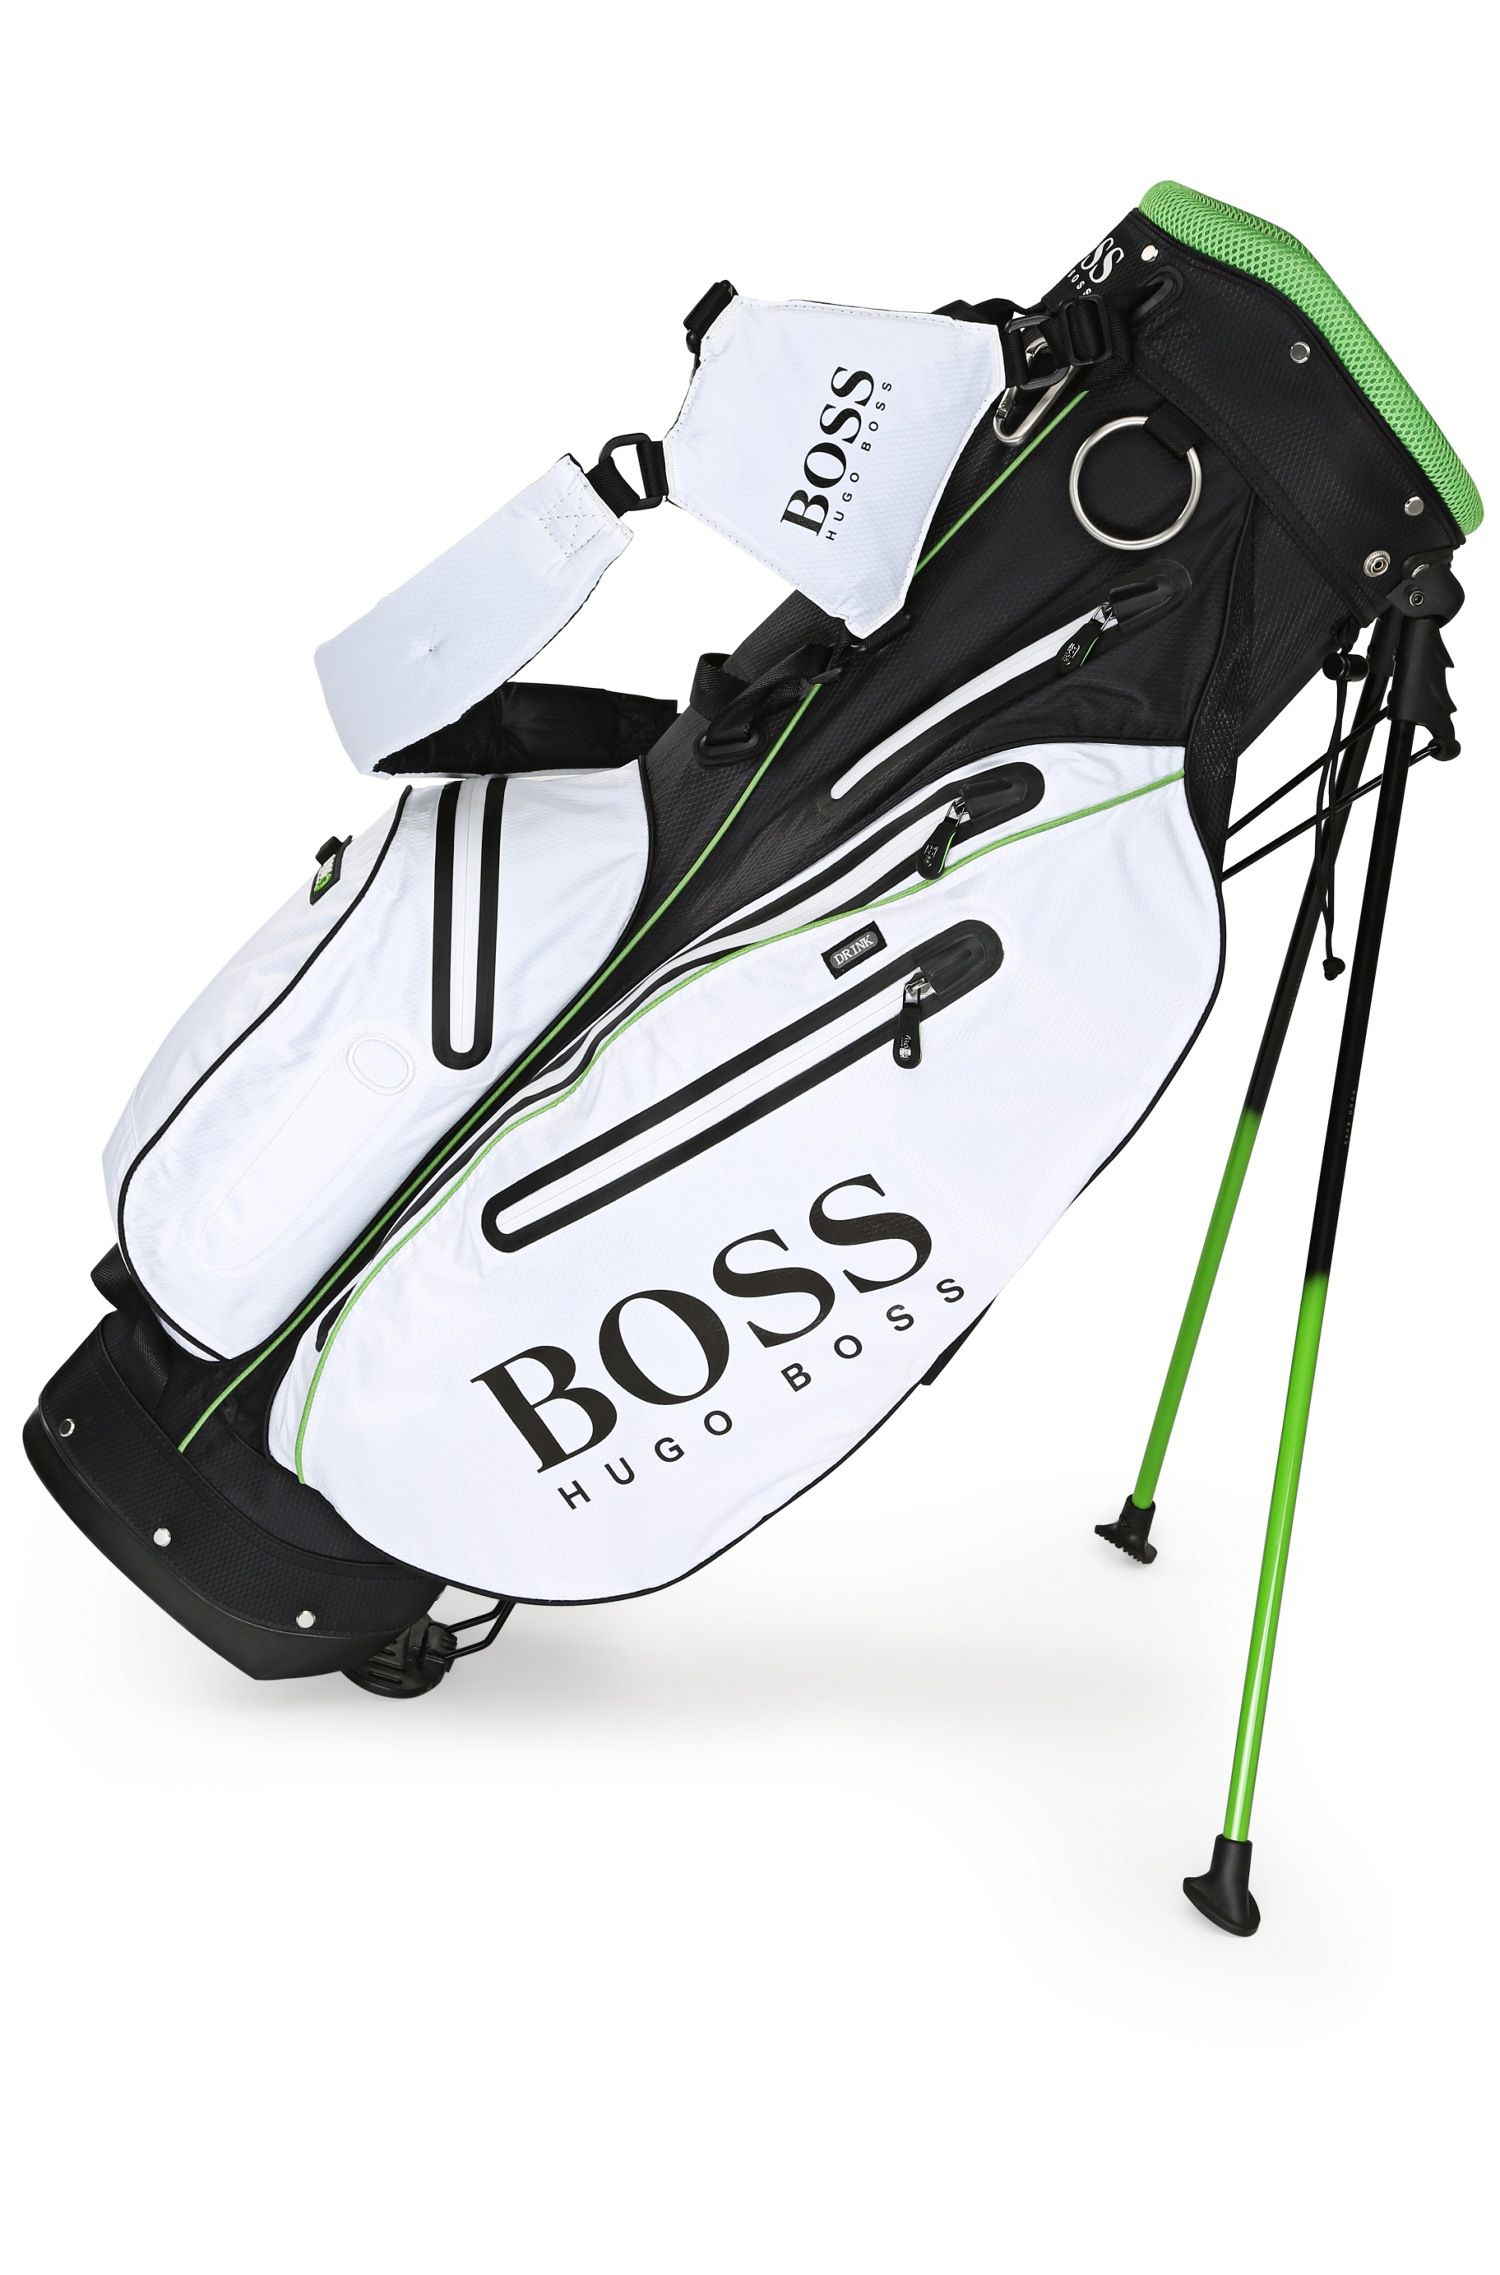 Grand sac de golf: «Golf_Stand»